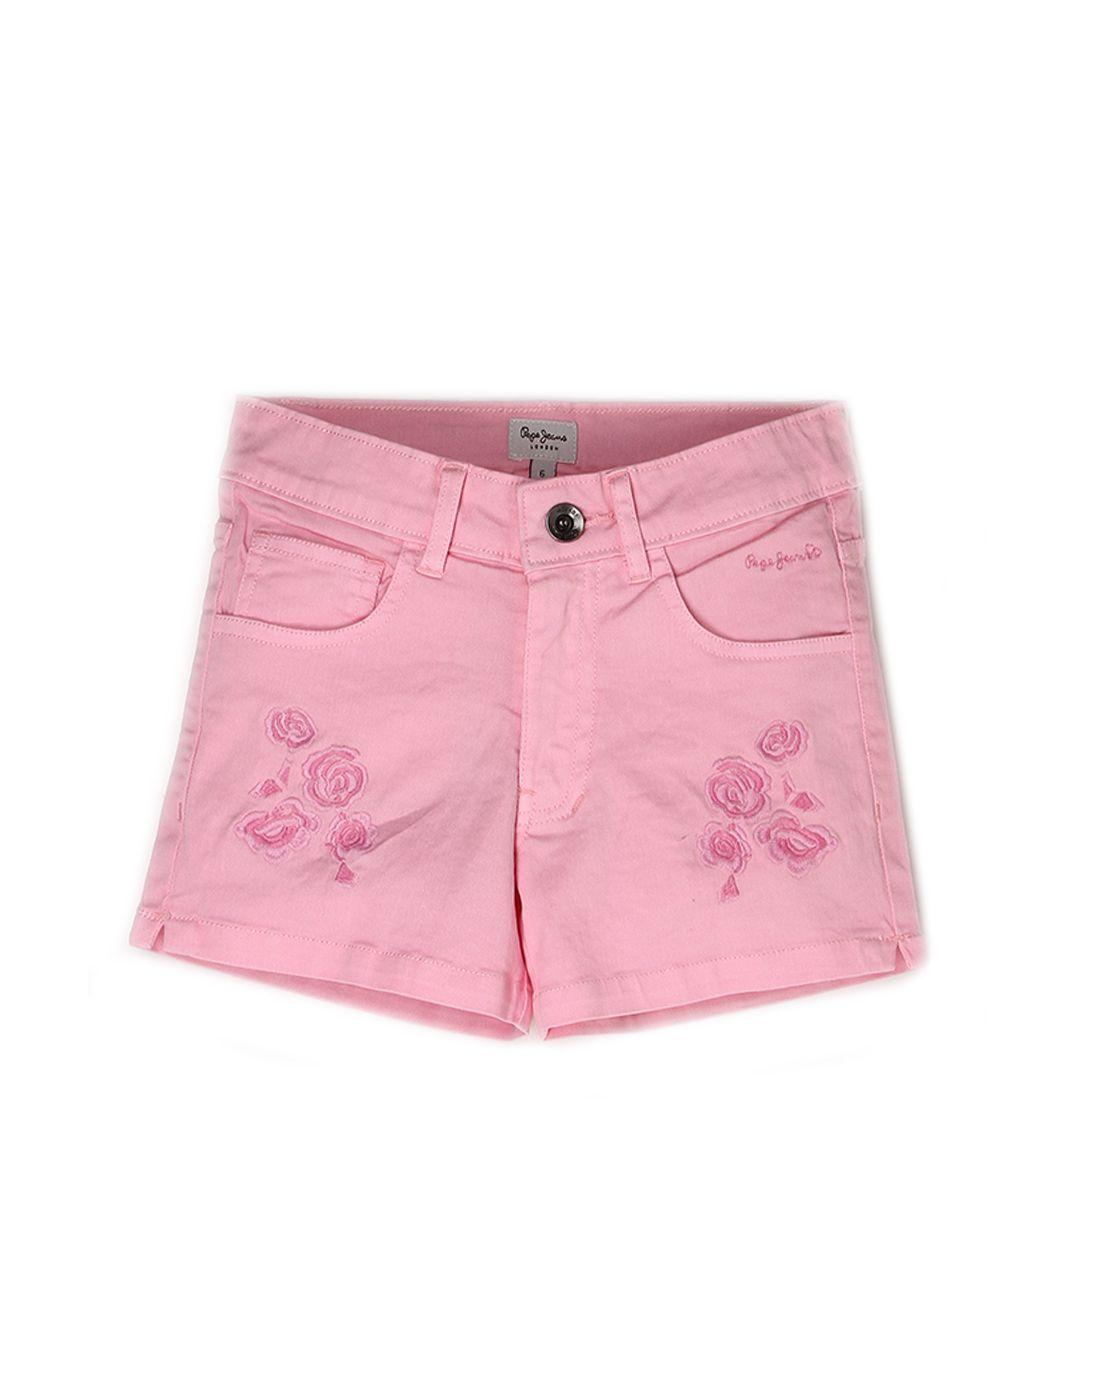 Pepe Jeans Girls Cotton  Regular Casual Pink Short